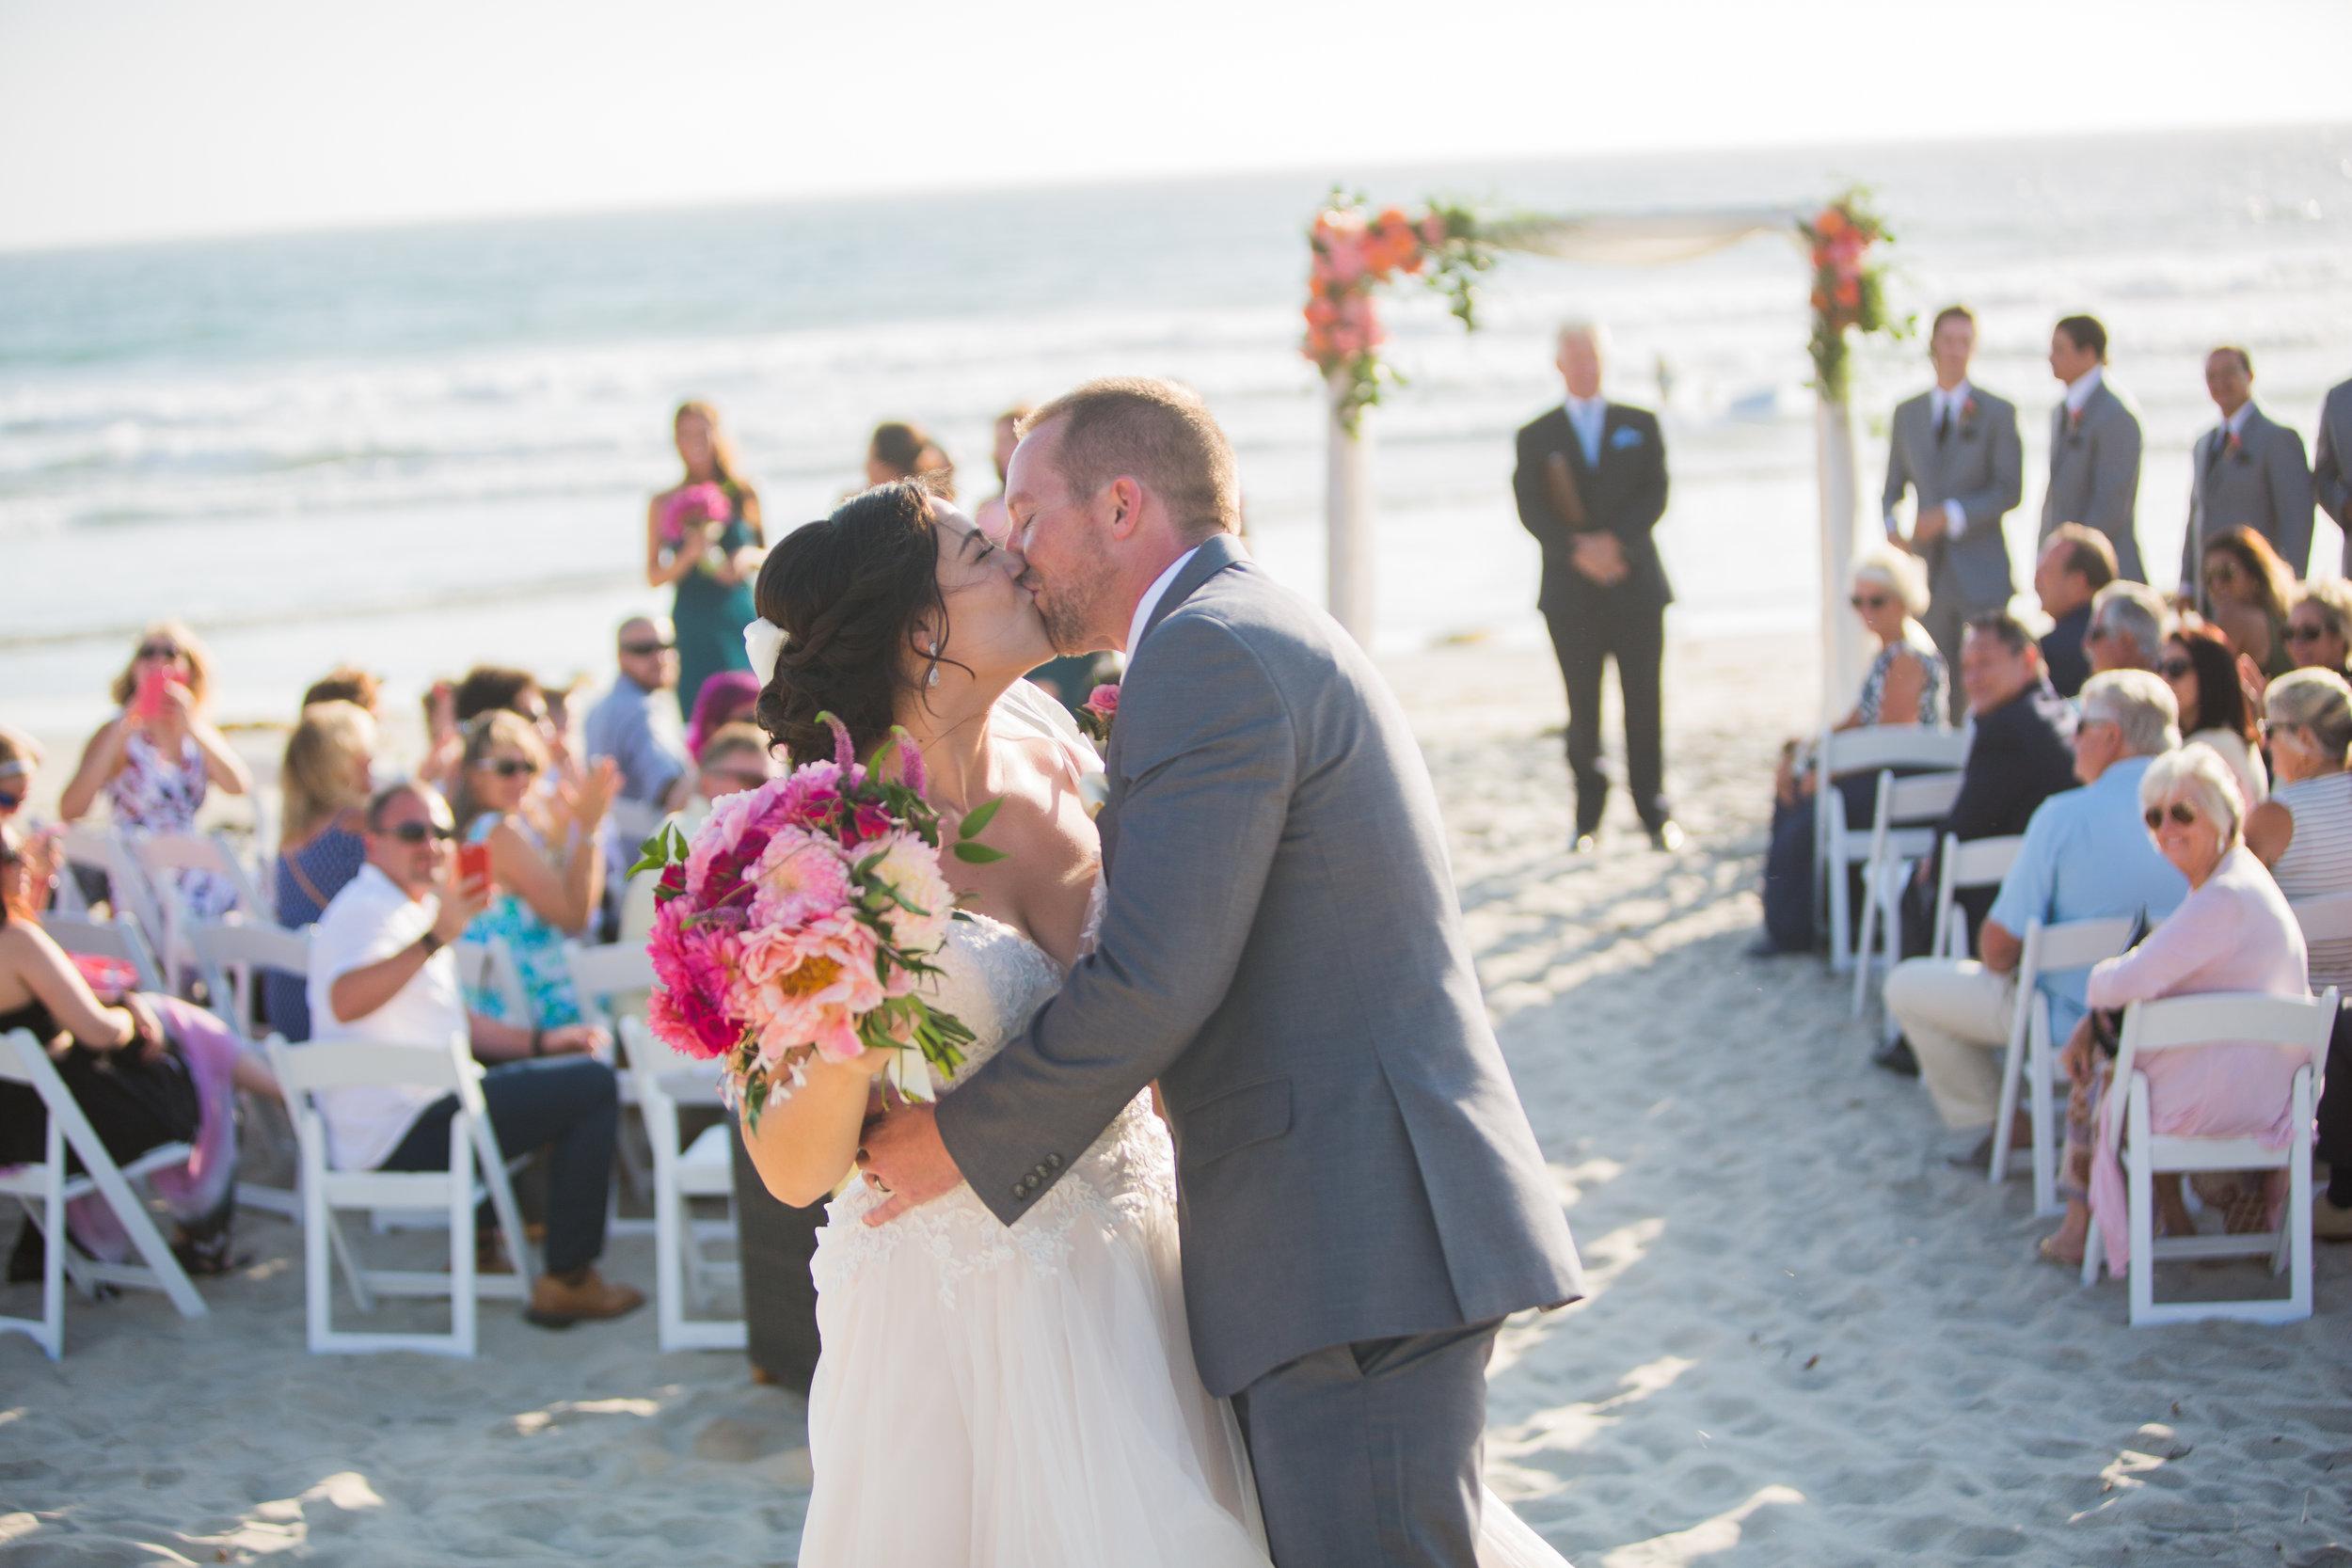 Pacific-Coast-Grill-Beach-Wedding-Olivia-Kevin-2016-380.jpg